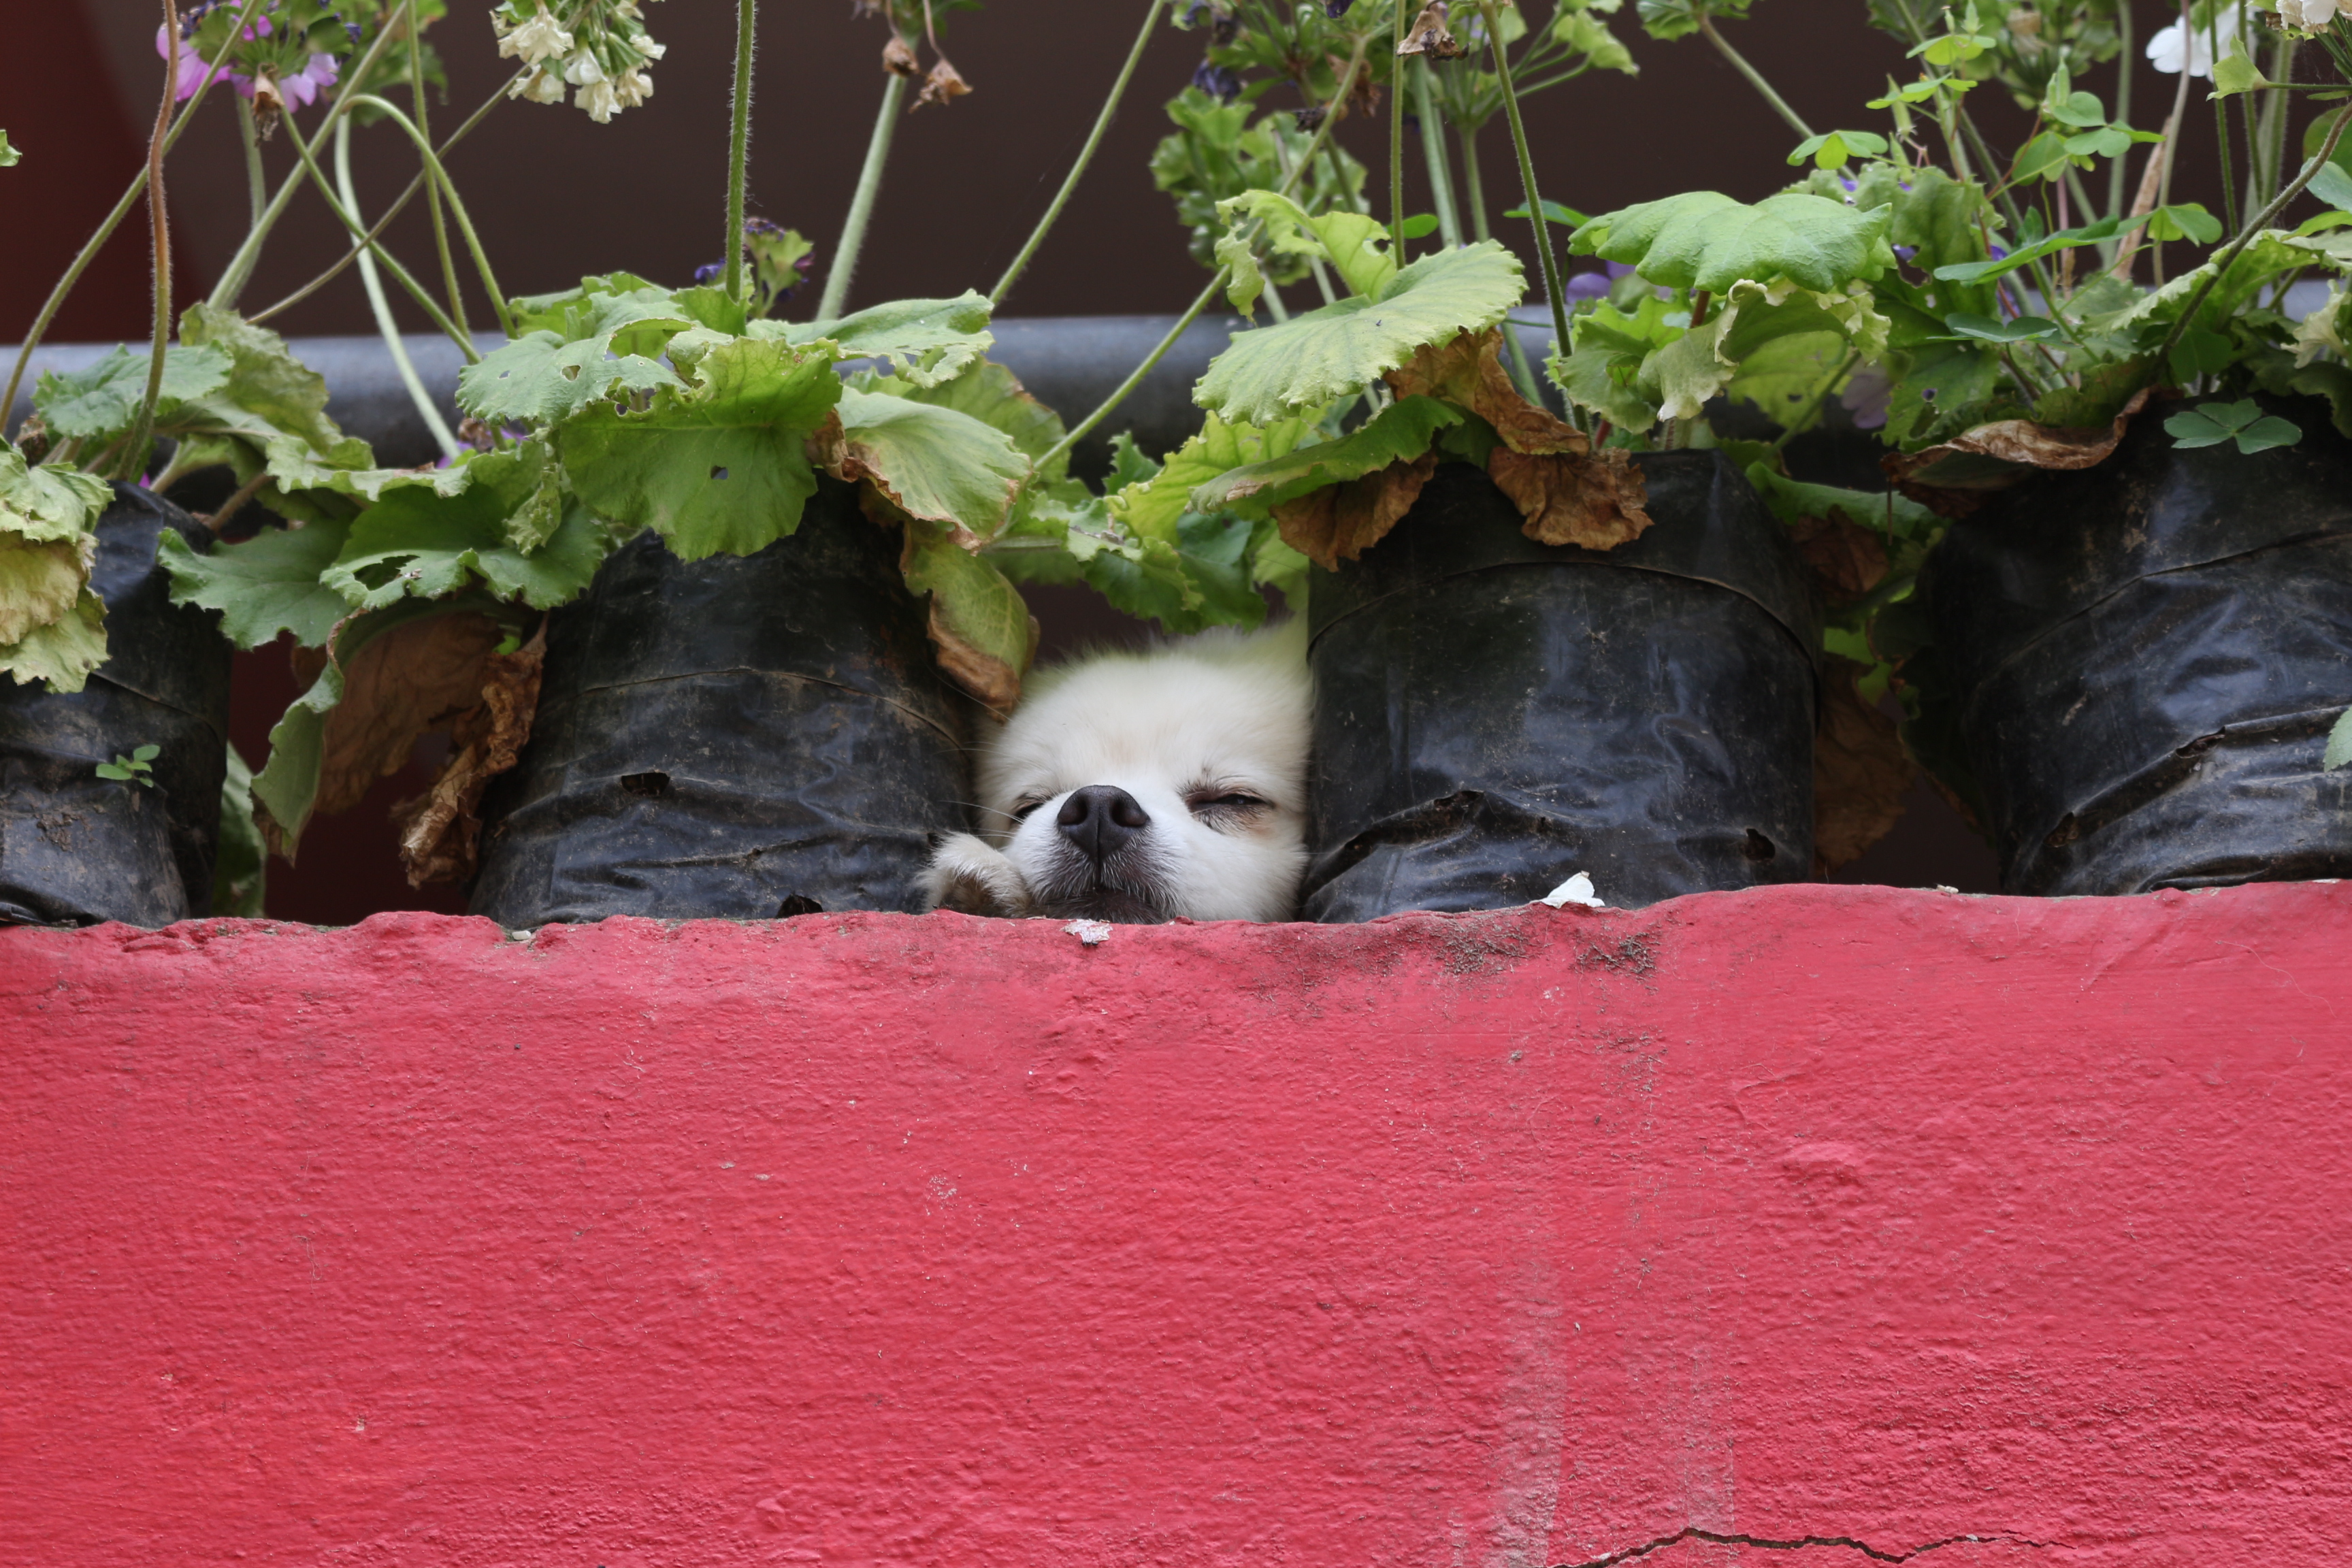 Dog or flower pot?, Animal, Cat, Kitten, Outdoor, HQ Photo